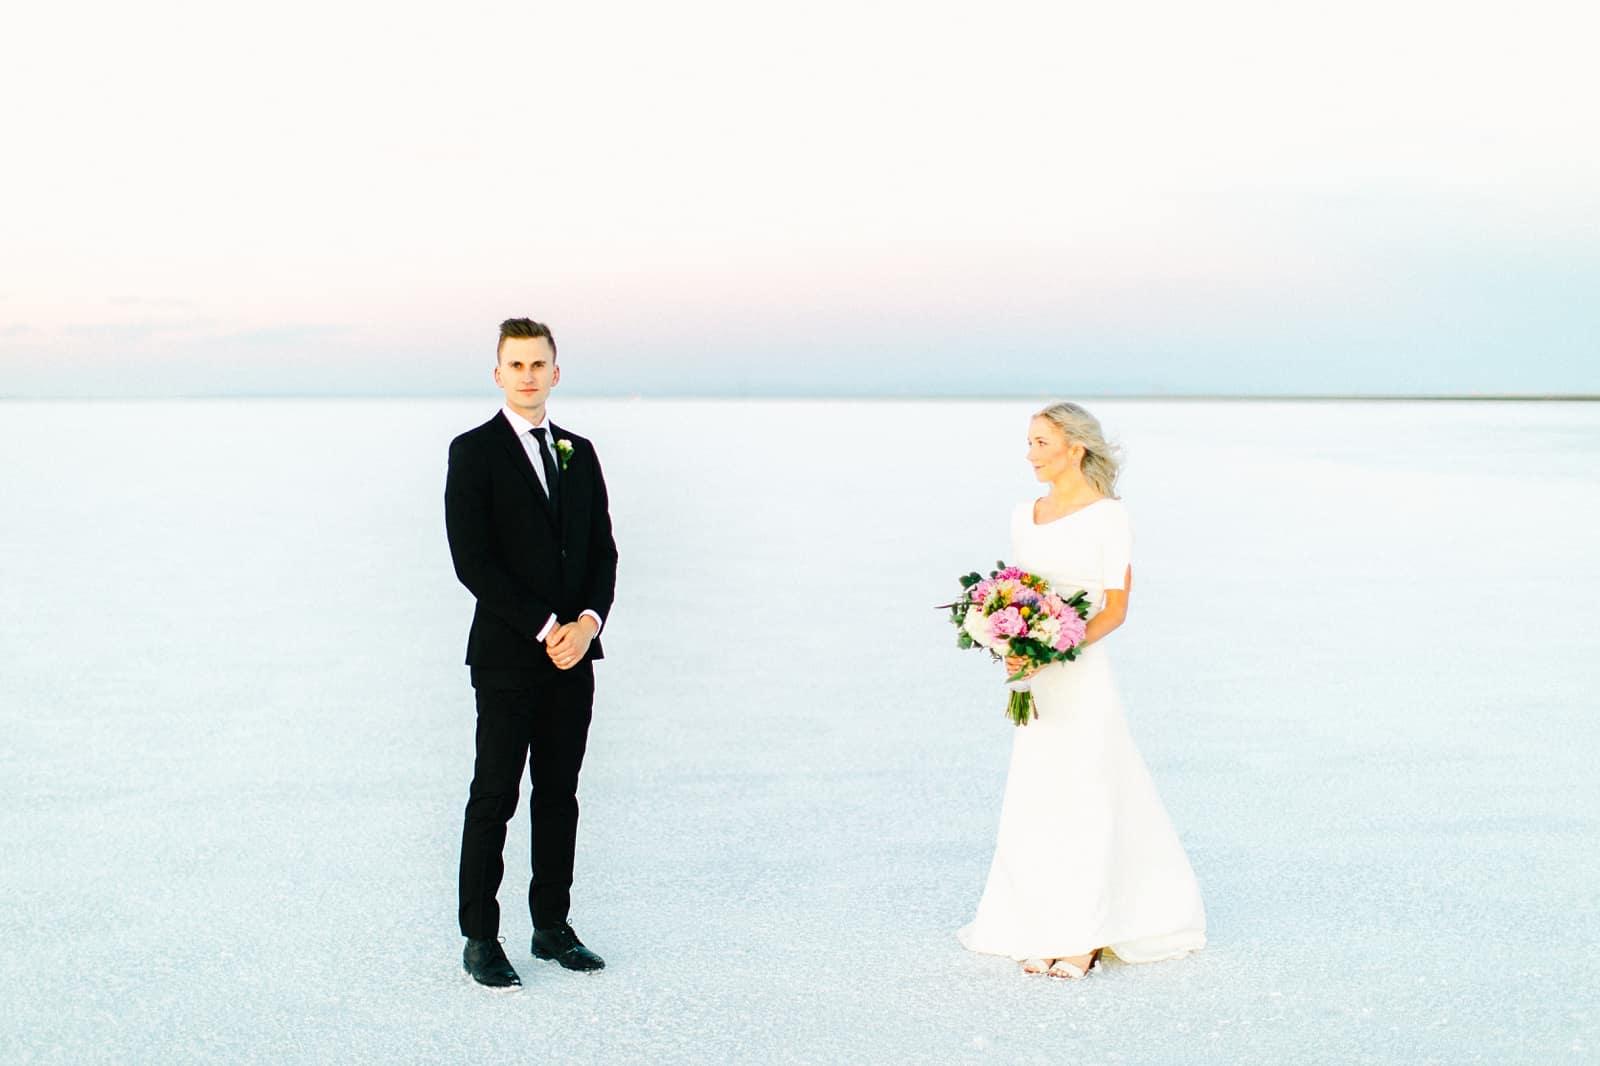 Bonneville Salt Flats Utah Wedding Photography, destination wedding, light and airy film photography